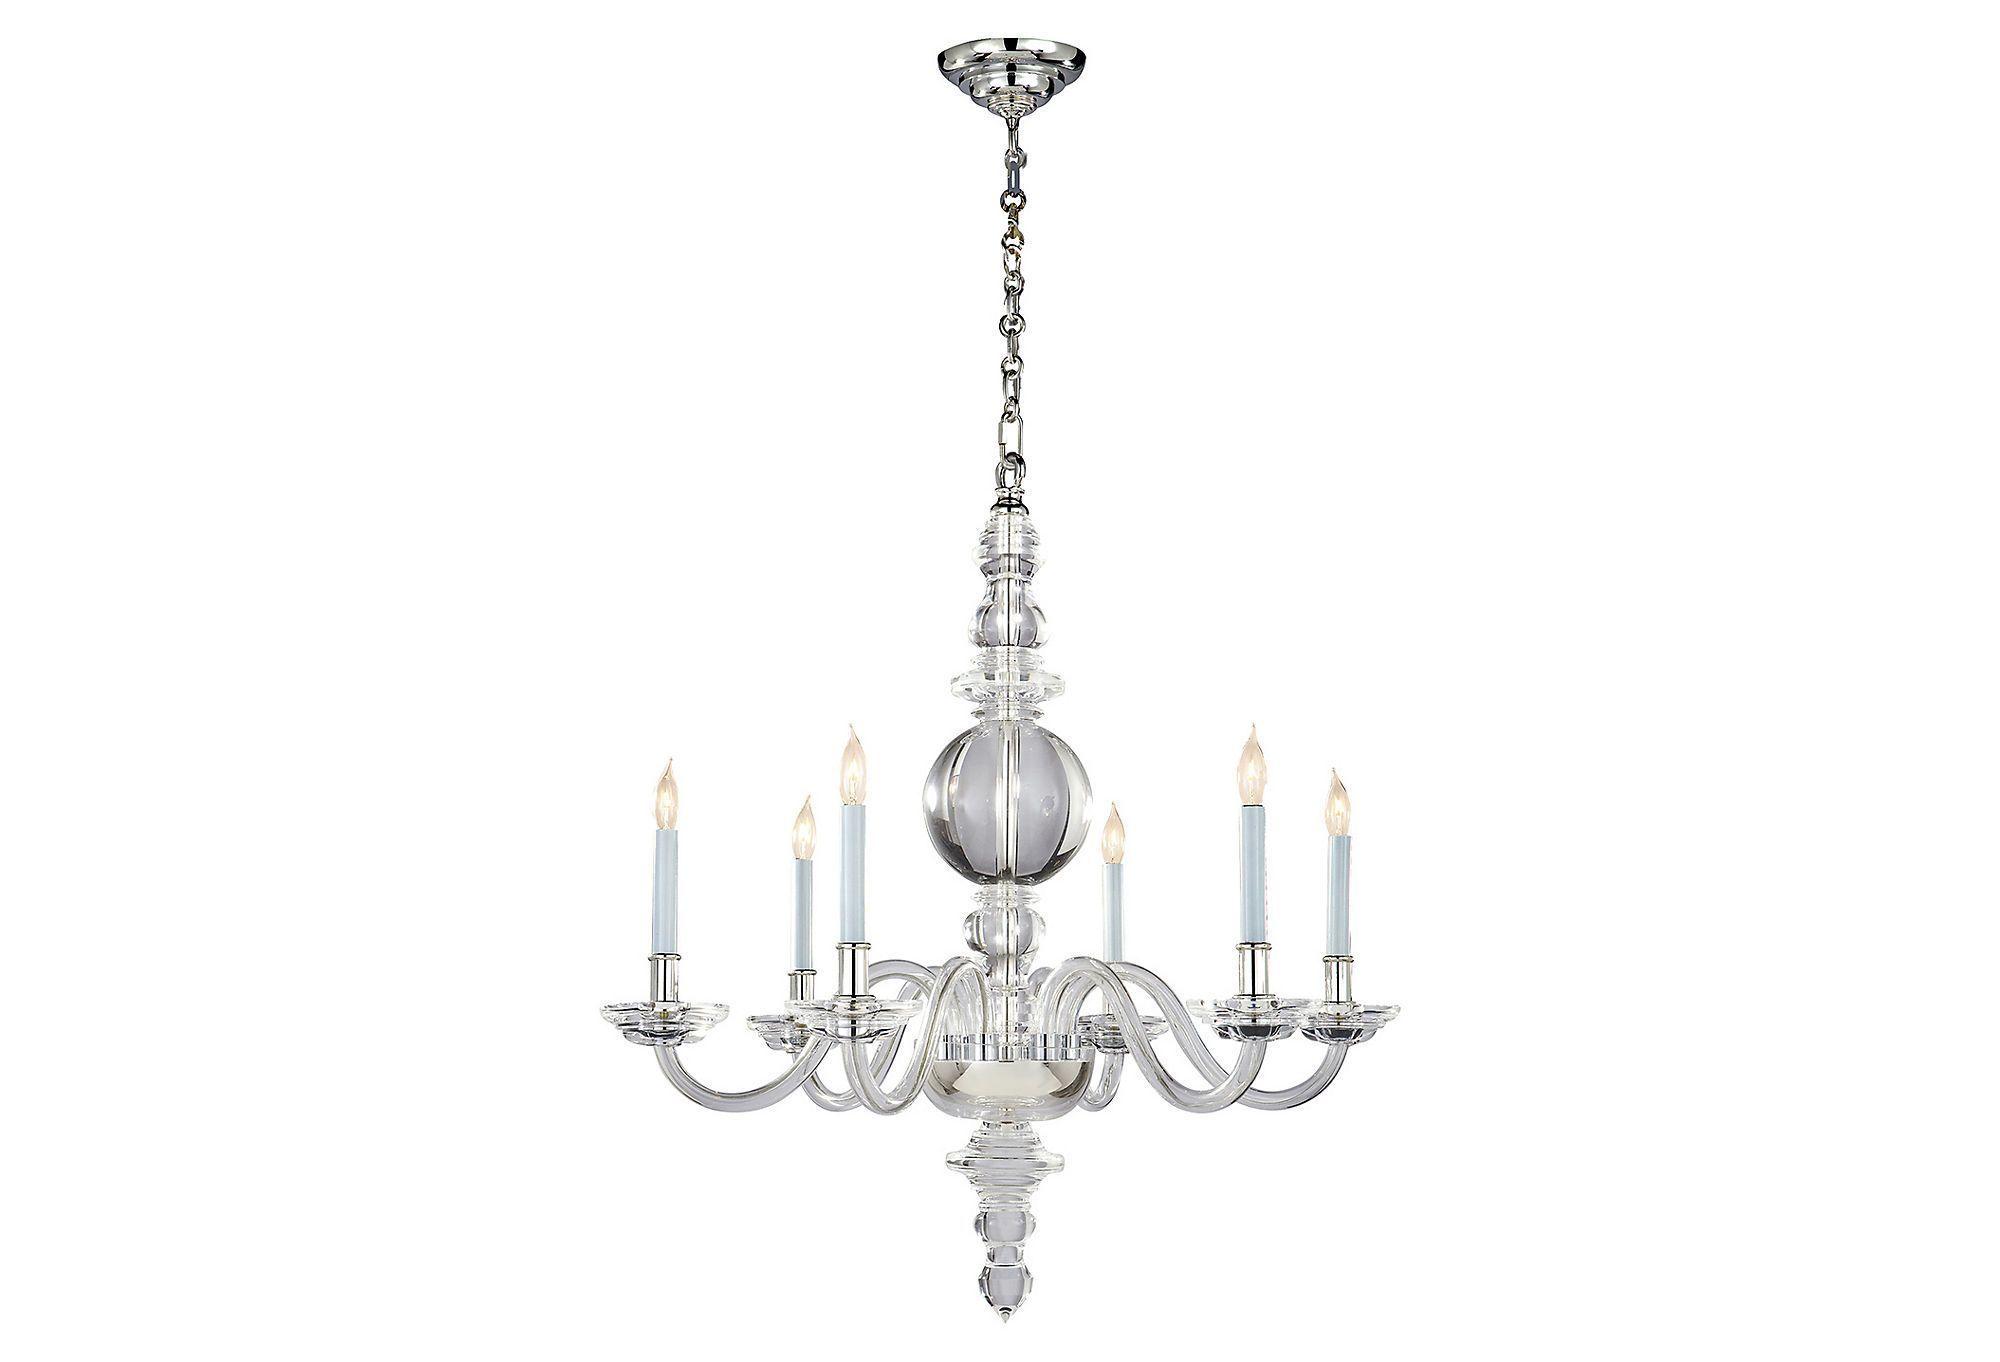 George ii chandelier crystal one kings lane illuminazione george ii chandelier crystal one kings lane arubaitofo Images